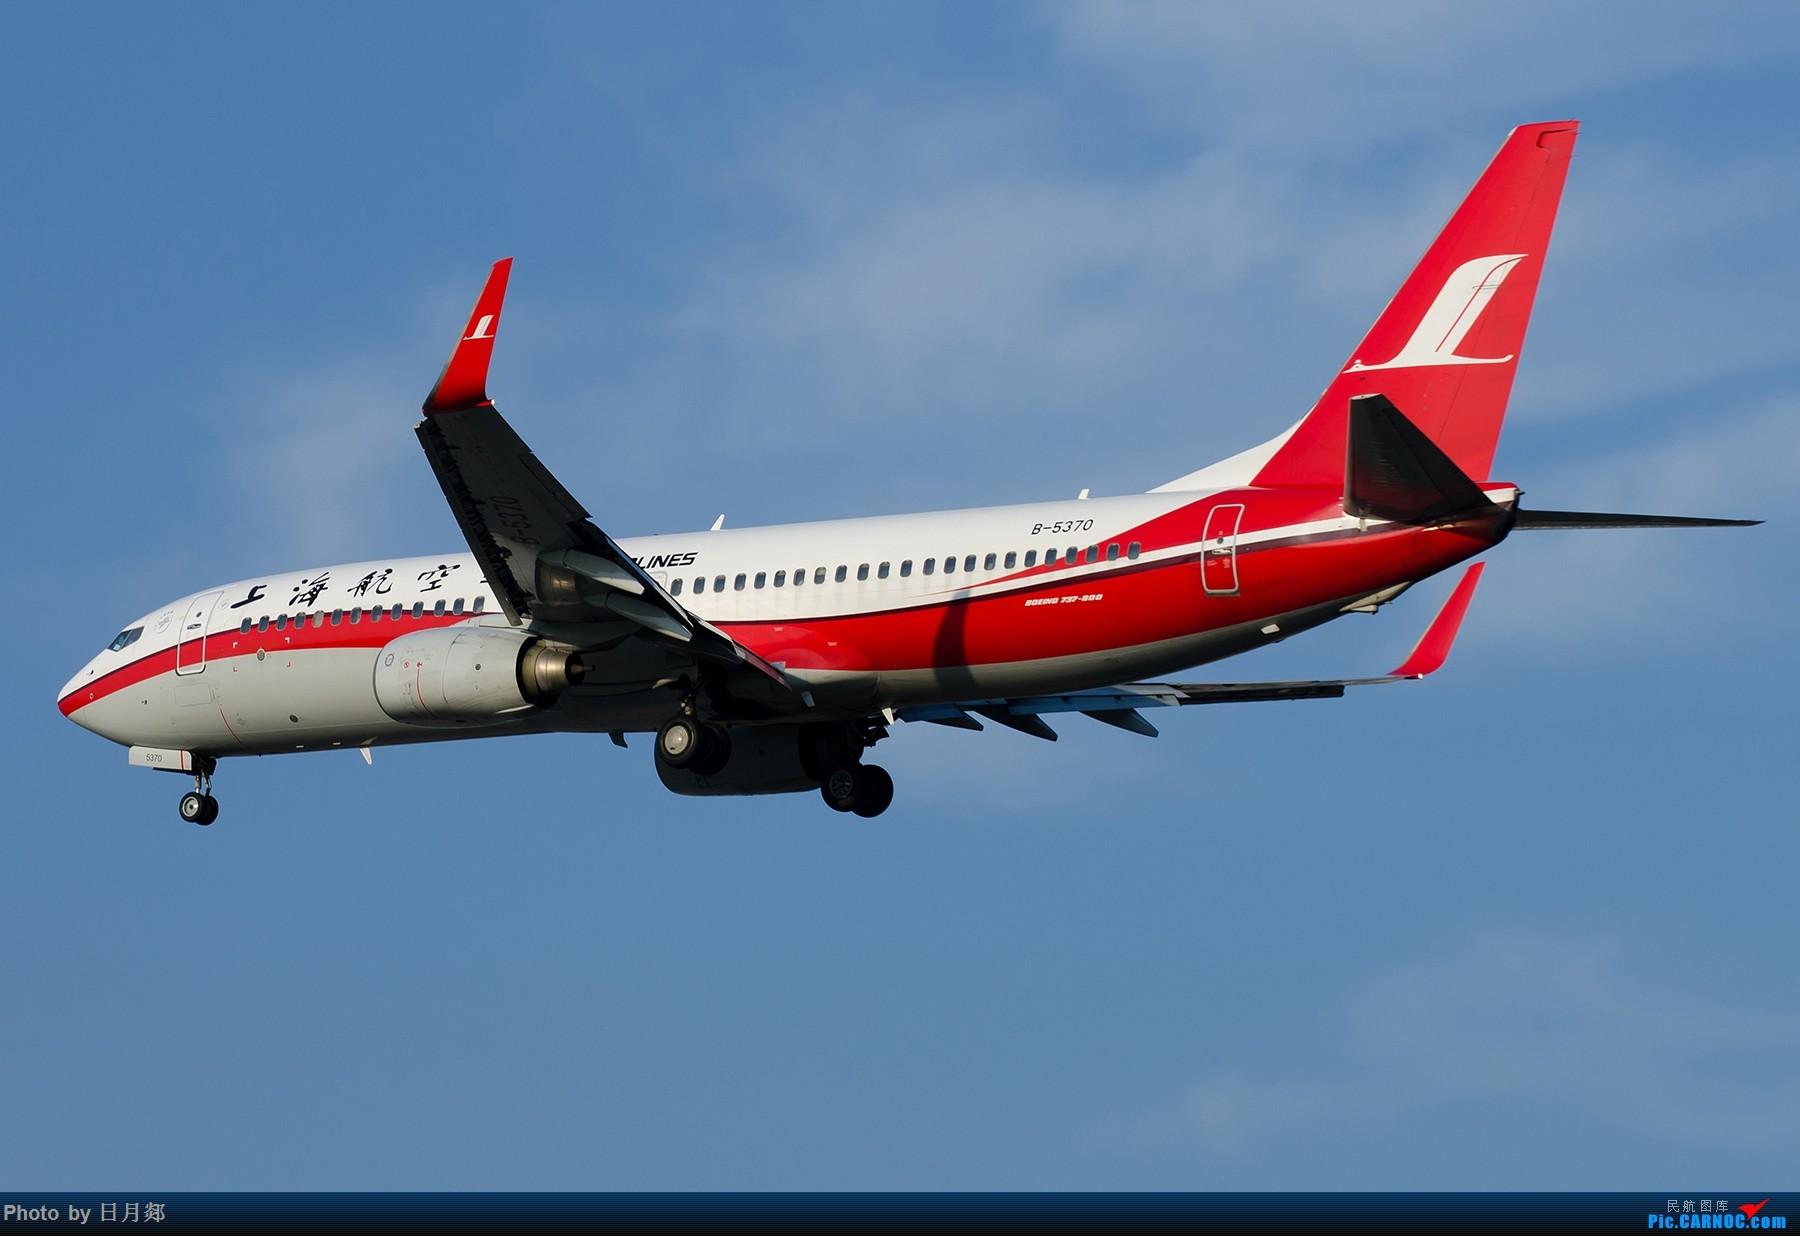 Re:[原创]【SHA拍机*1800大图】轻度污染来临前宝贵的蓝天,且拍且珍惜 BOEING 737-800 B-5370 中国上海虹桥国际机场